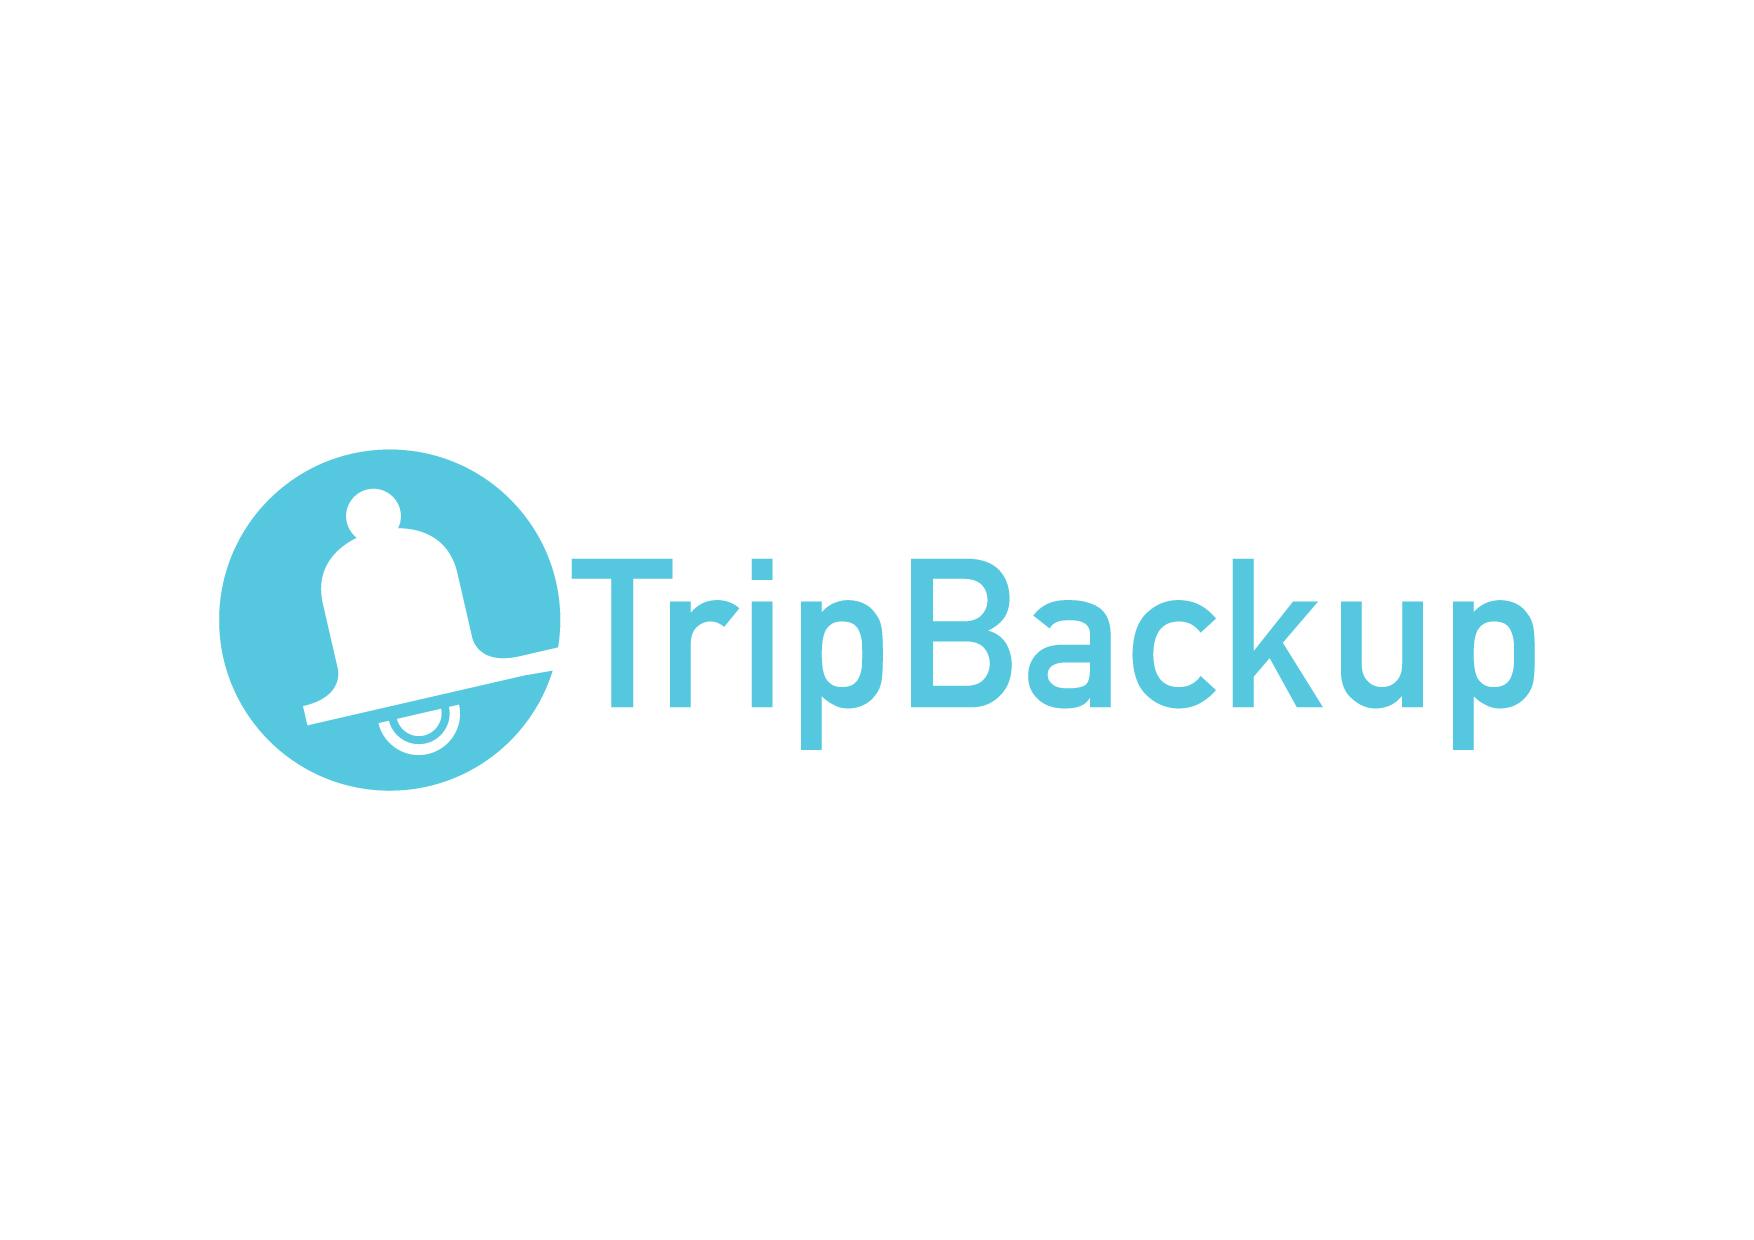 TripBackup Logo